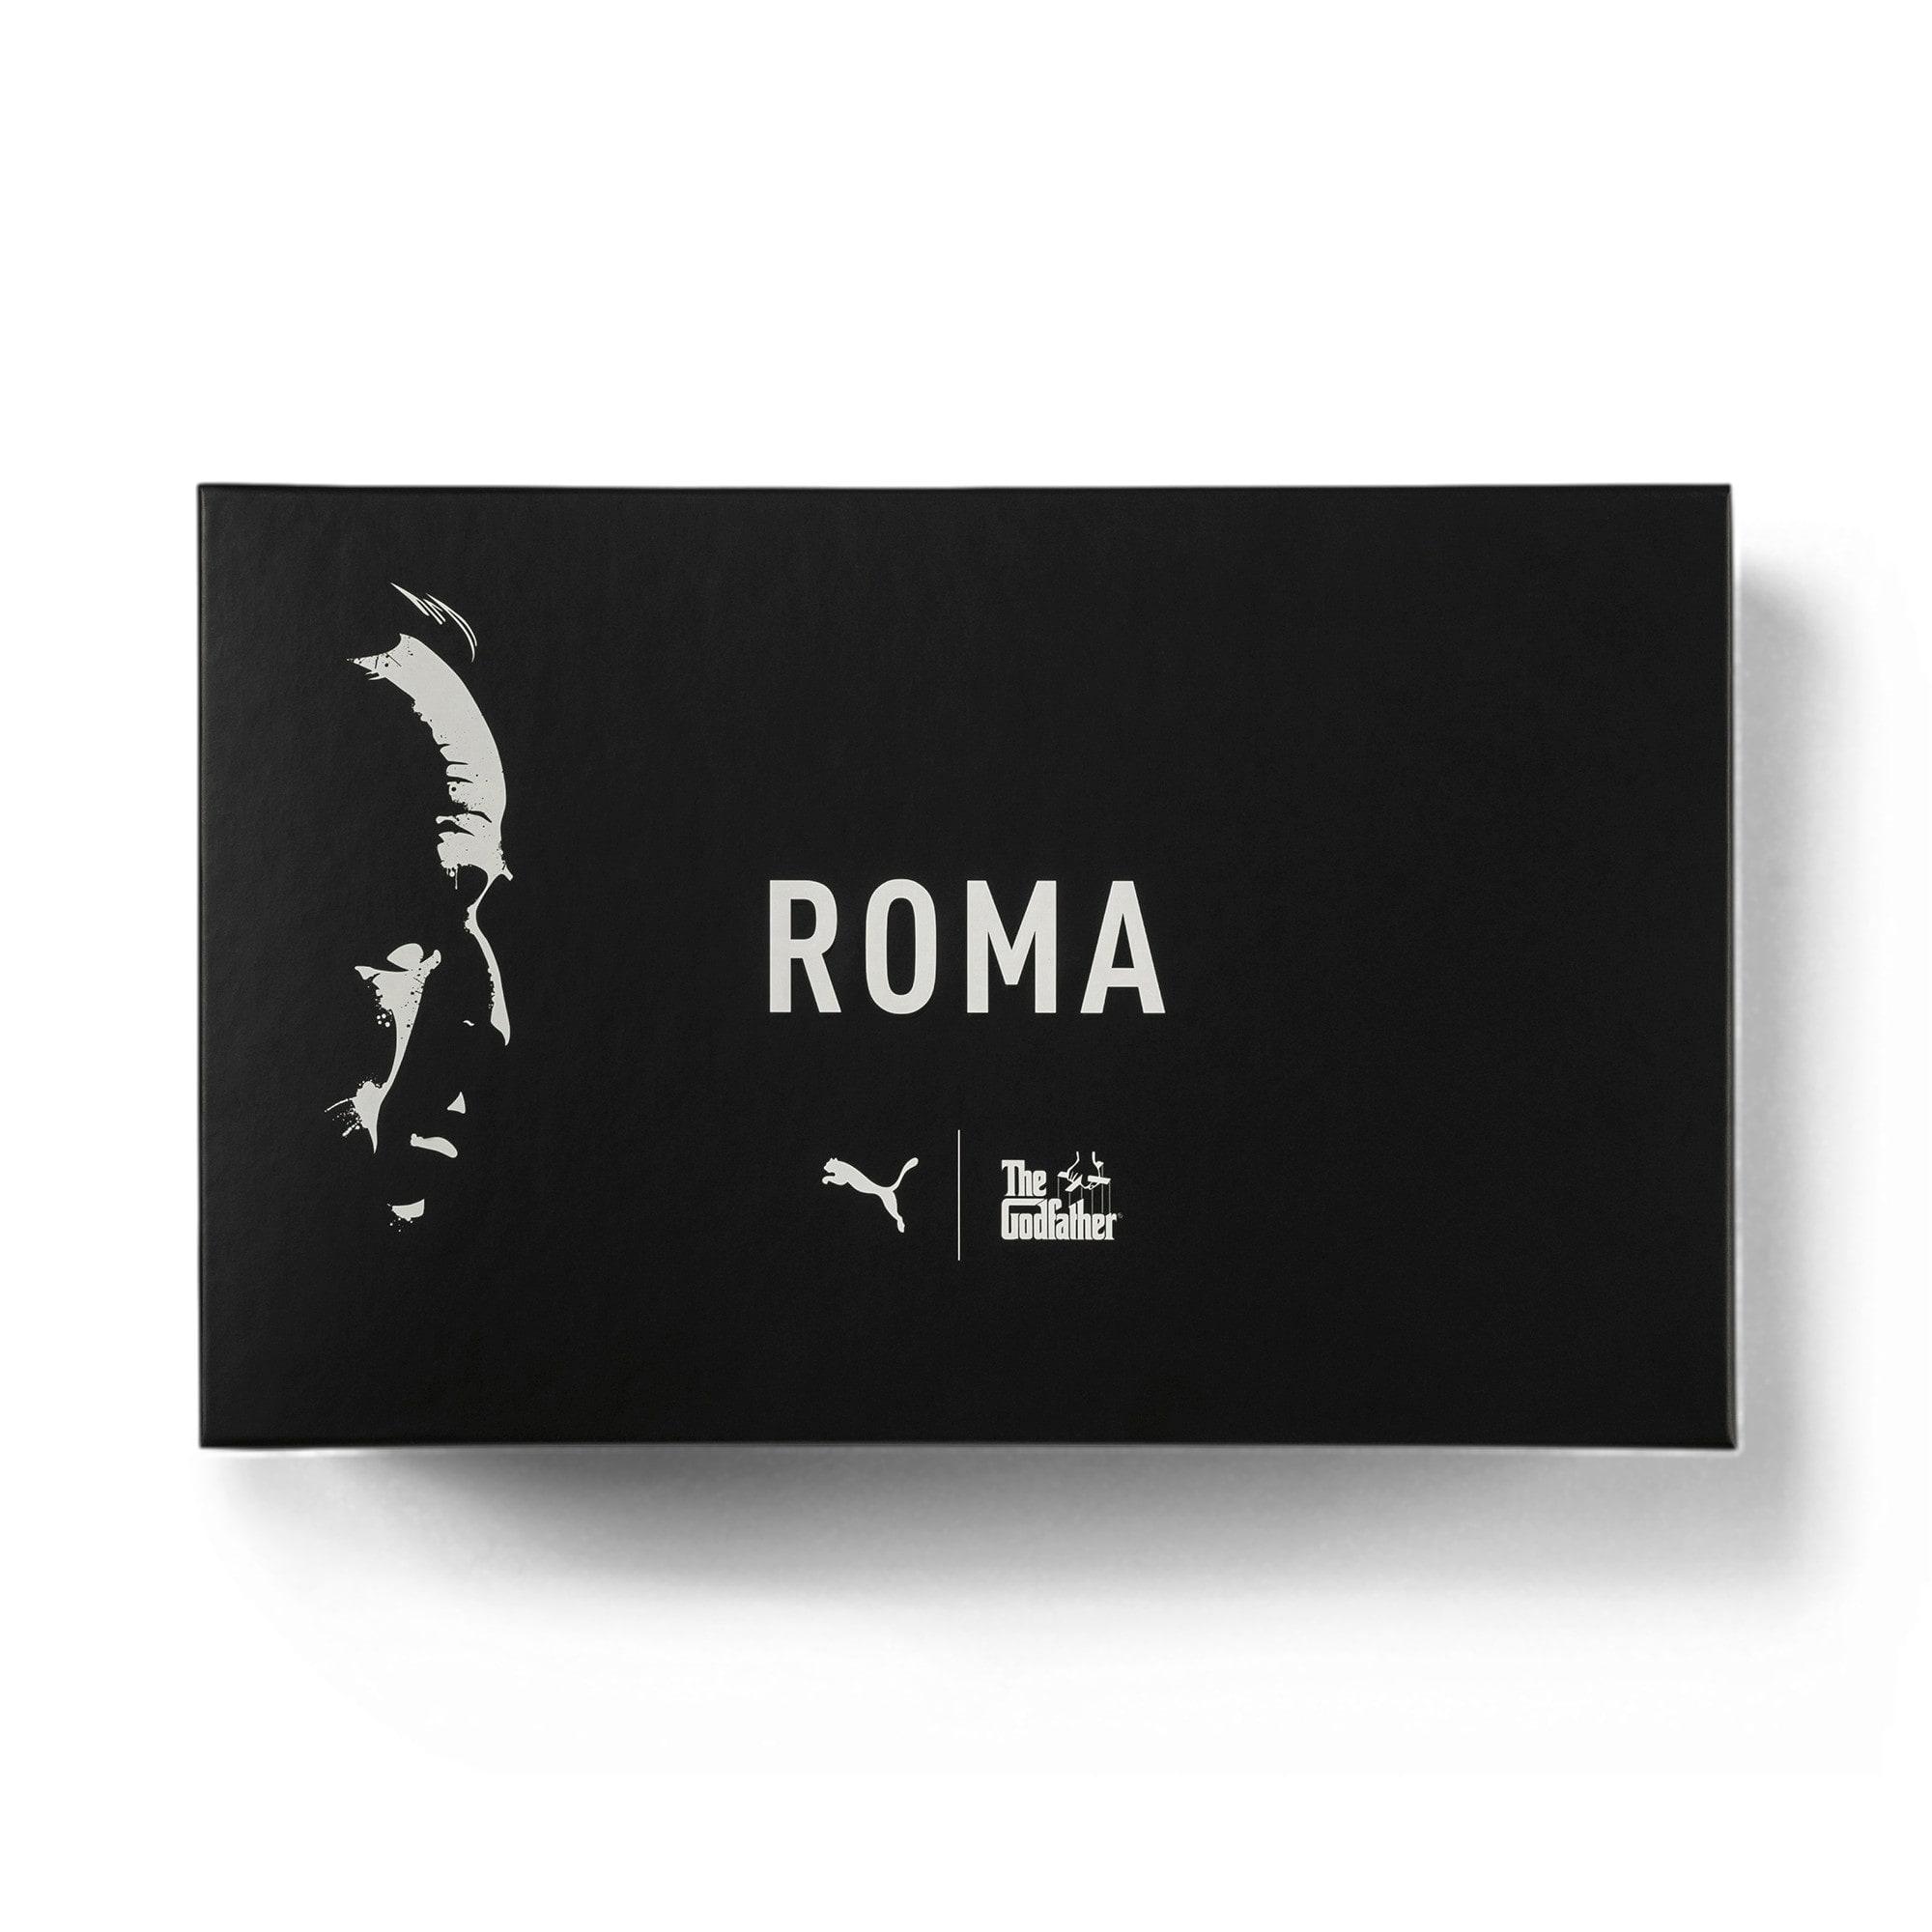 Miniatura 8 de Zapatos deportivos PUMA x THE GODFATHER Roma Woltz, WINDCHIME-Puma negro, mediano